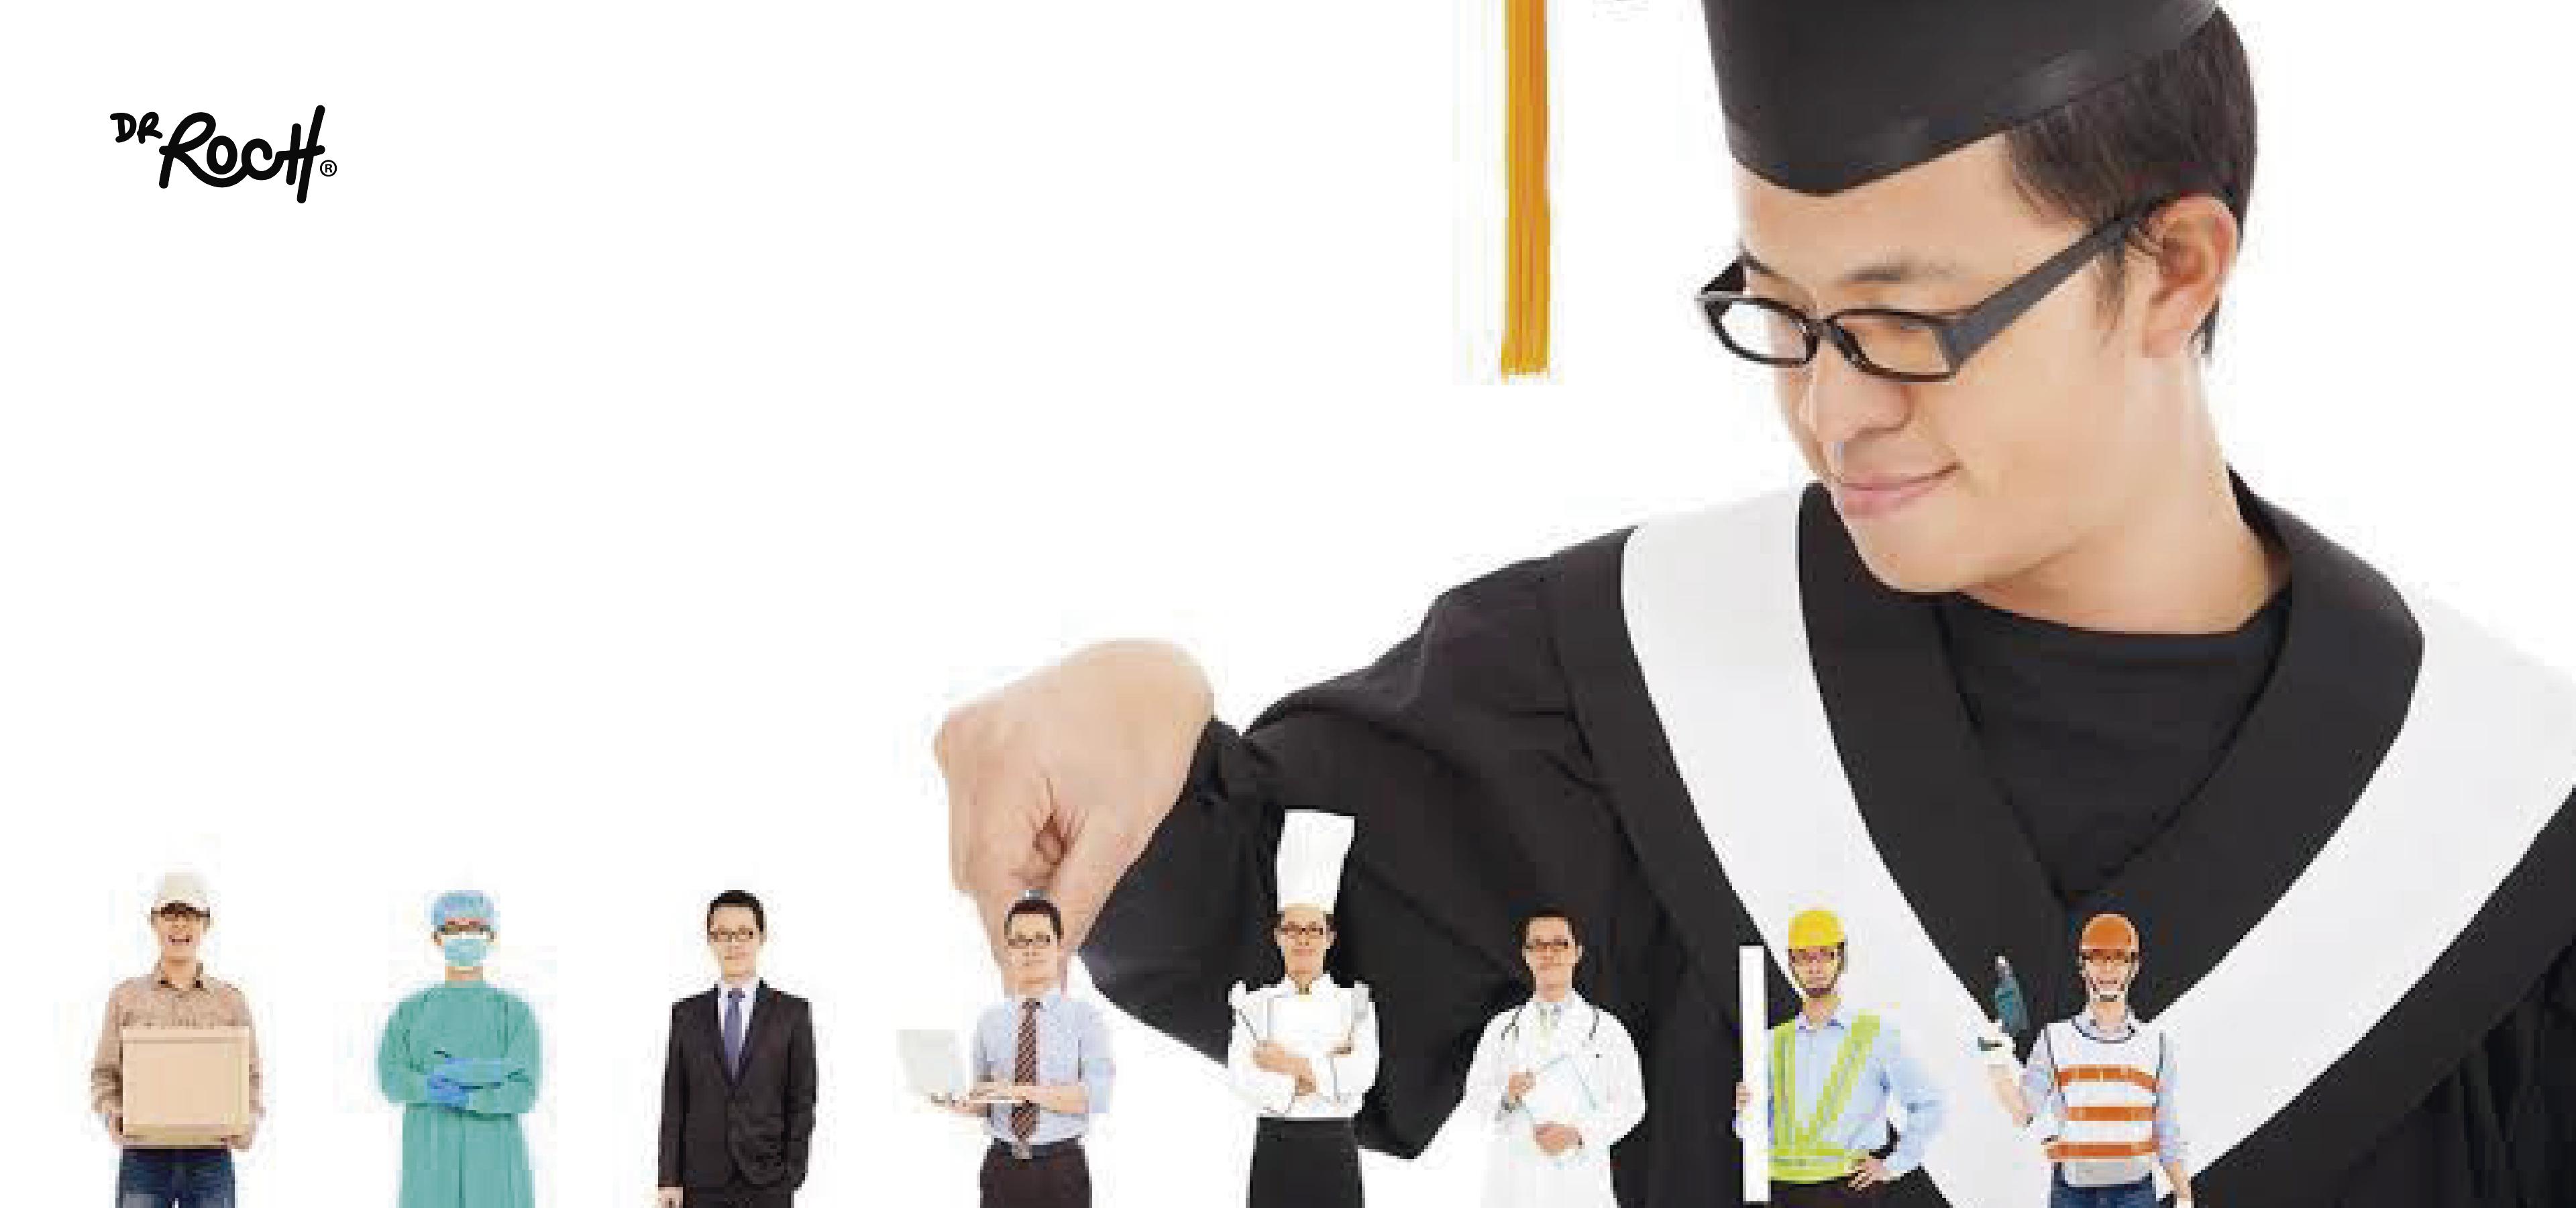 ¿Educación o Vocación empresarial?